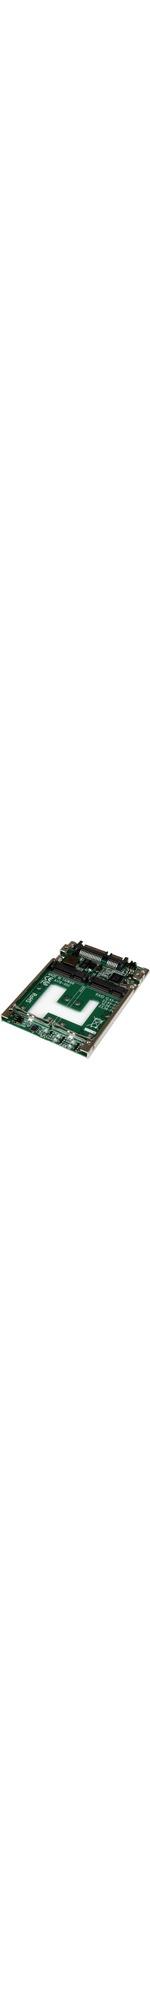 StarTech.com Dual mSATA SSD to 2.5And#34; SATA RAID Adapter Converter - Serial ATA/600 Controller - SATA/600